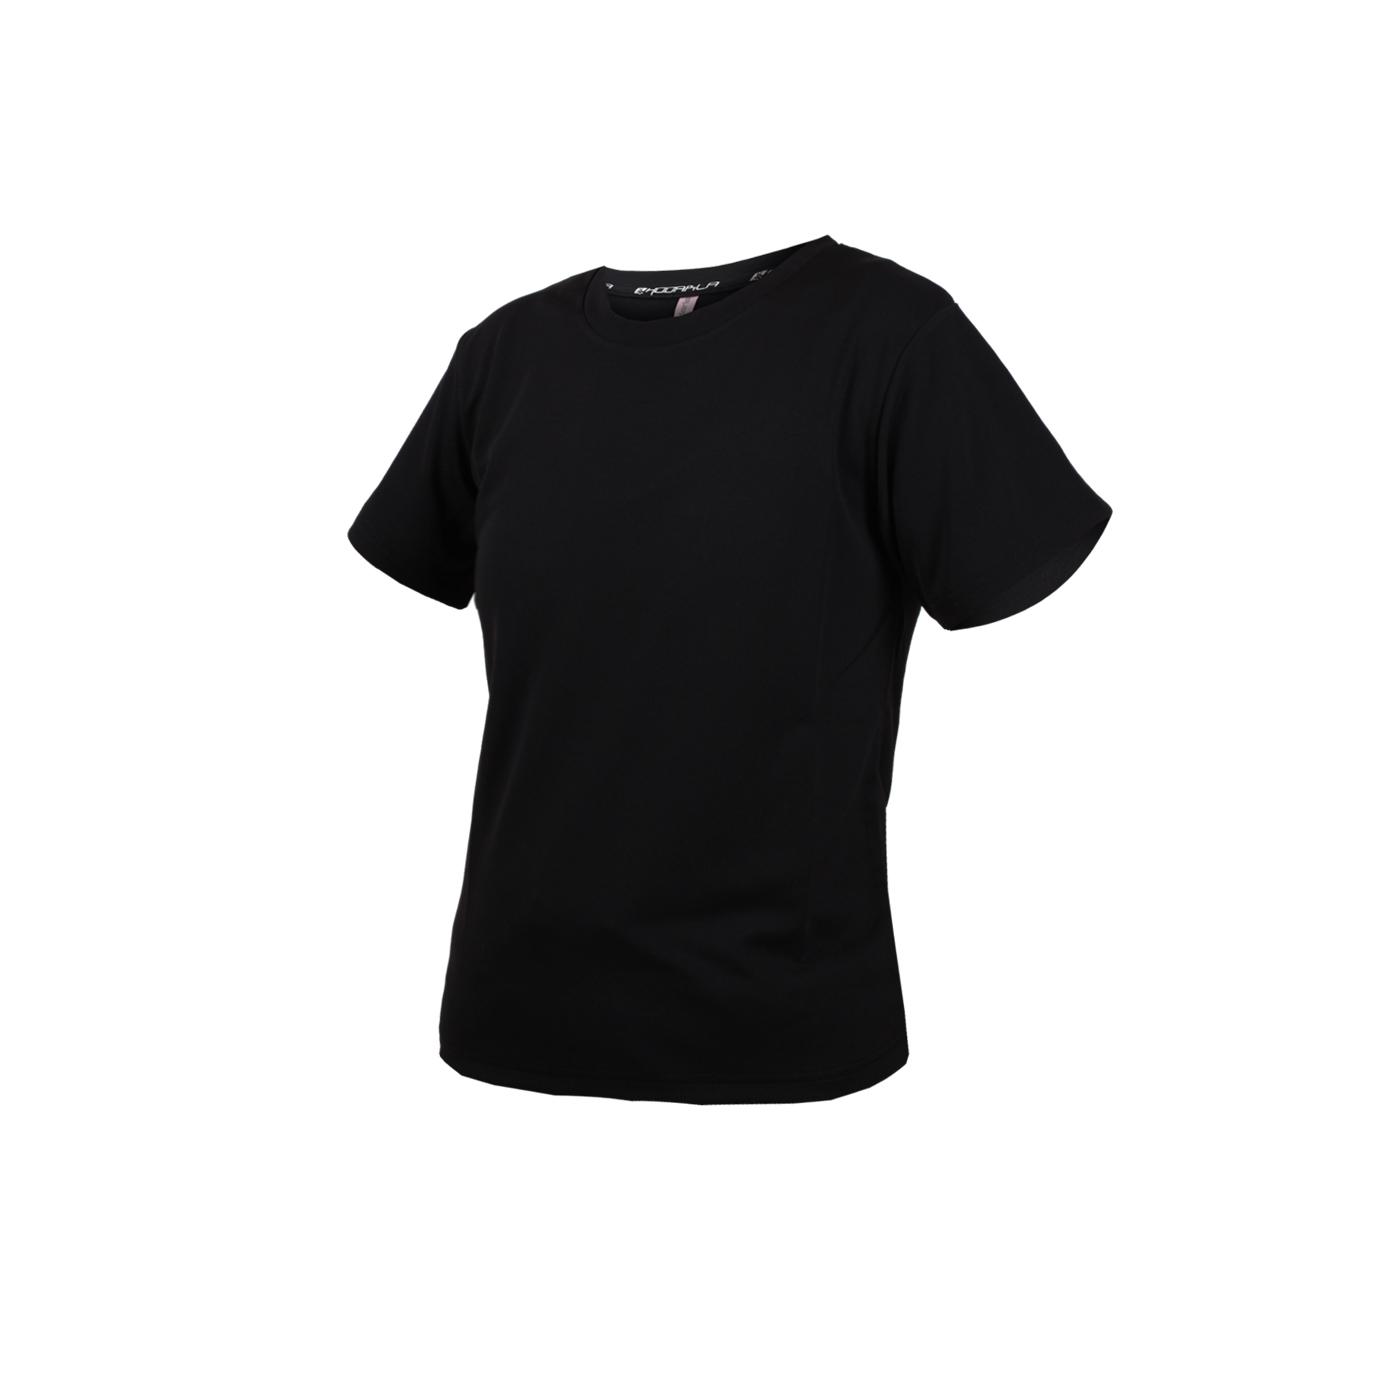 HODARLA 童裝-激膚無感衣 3138701 - 黑